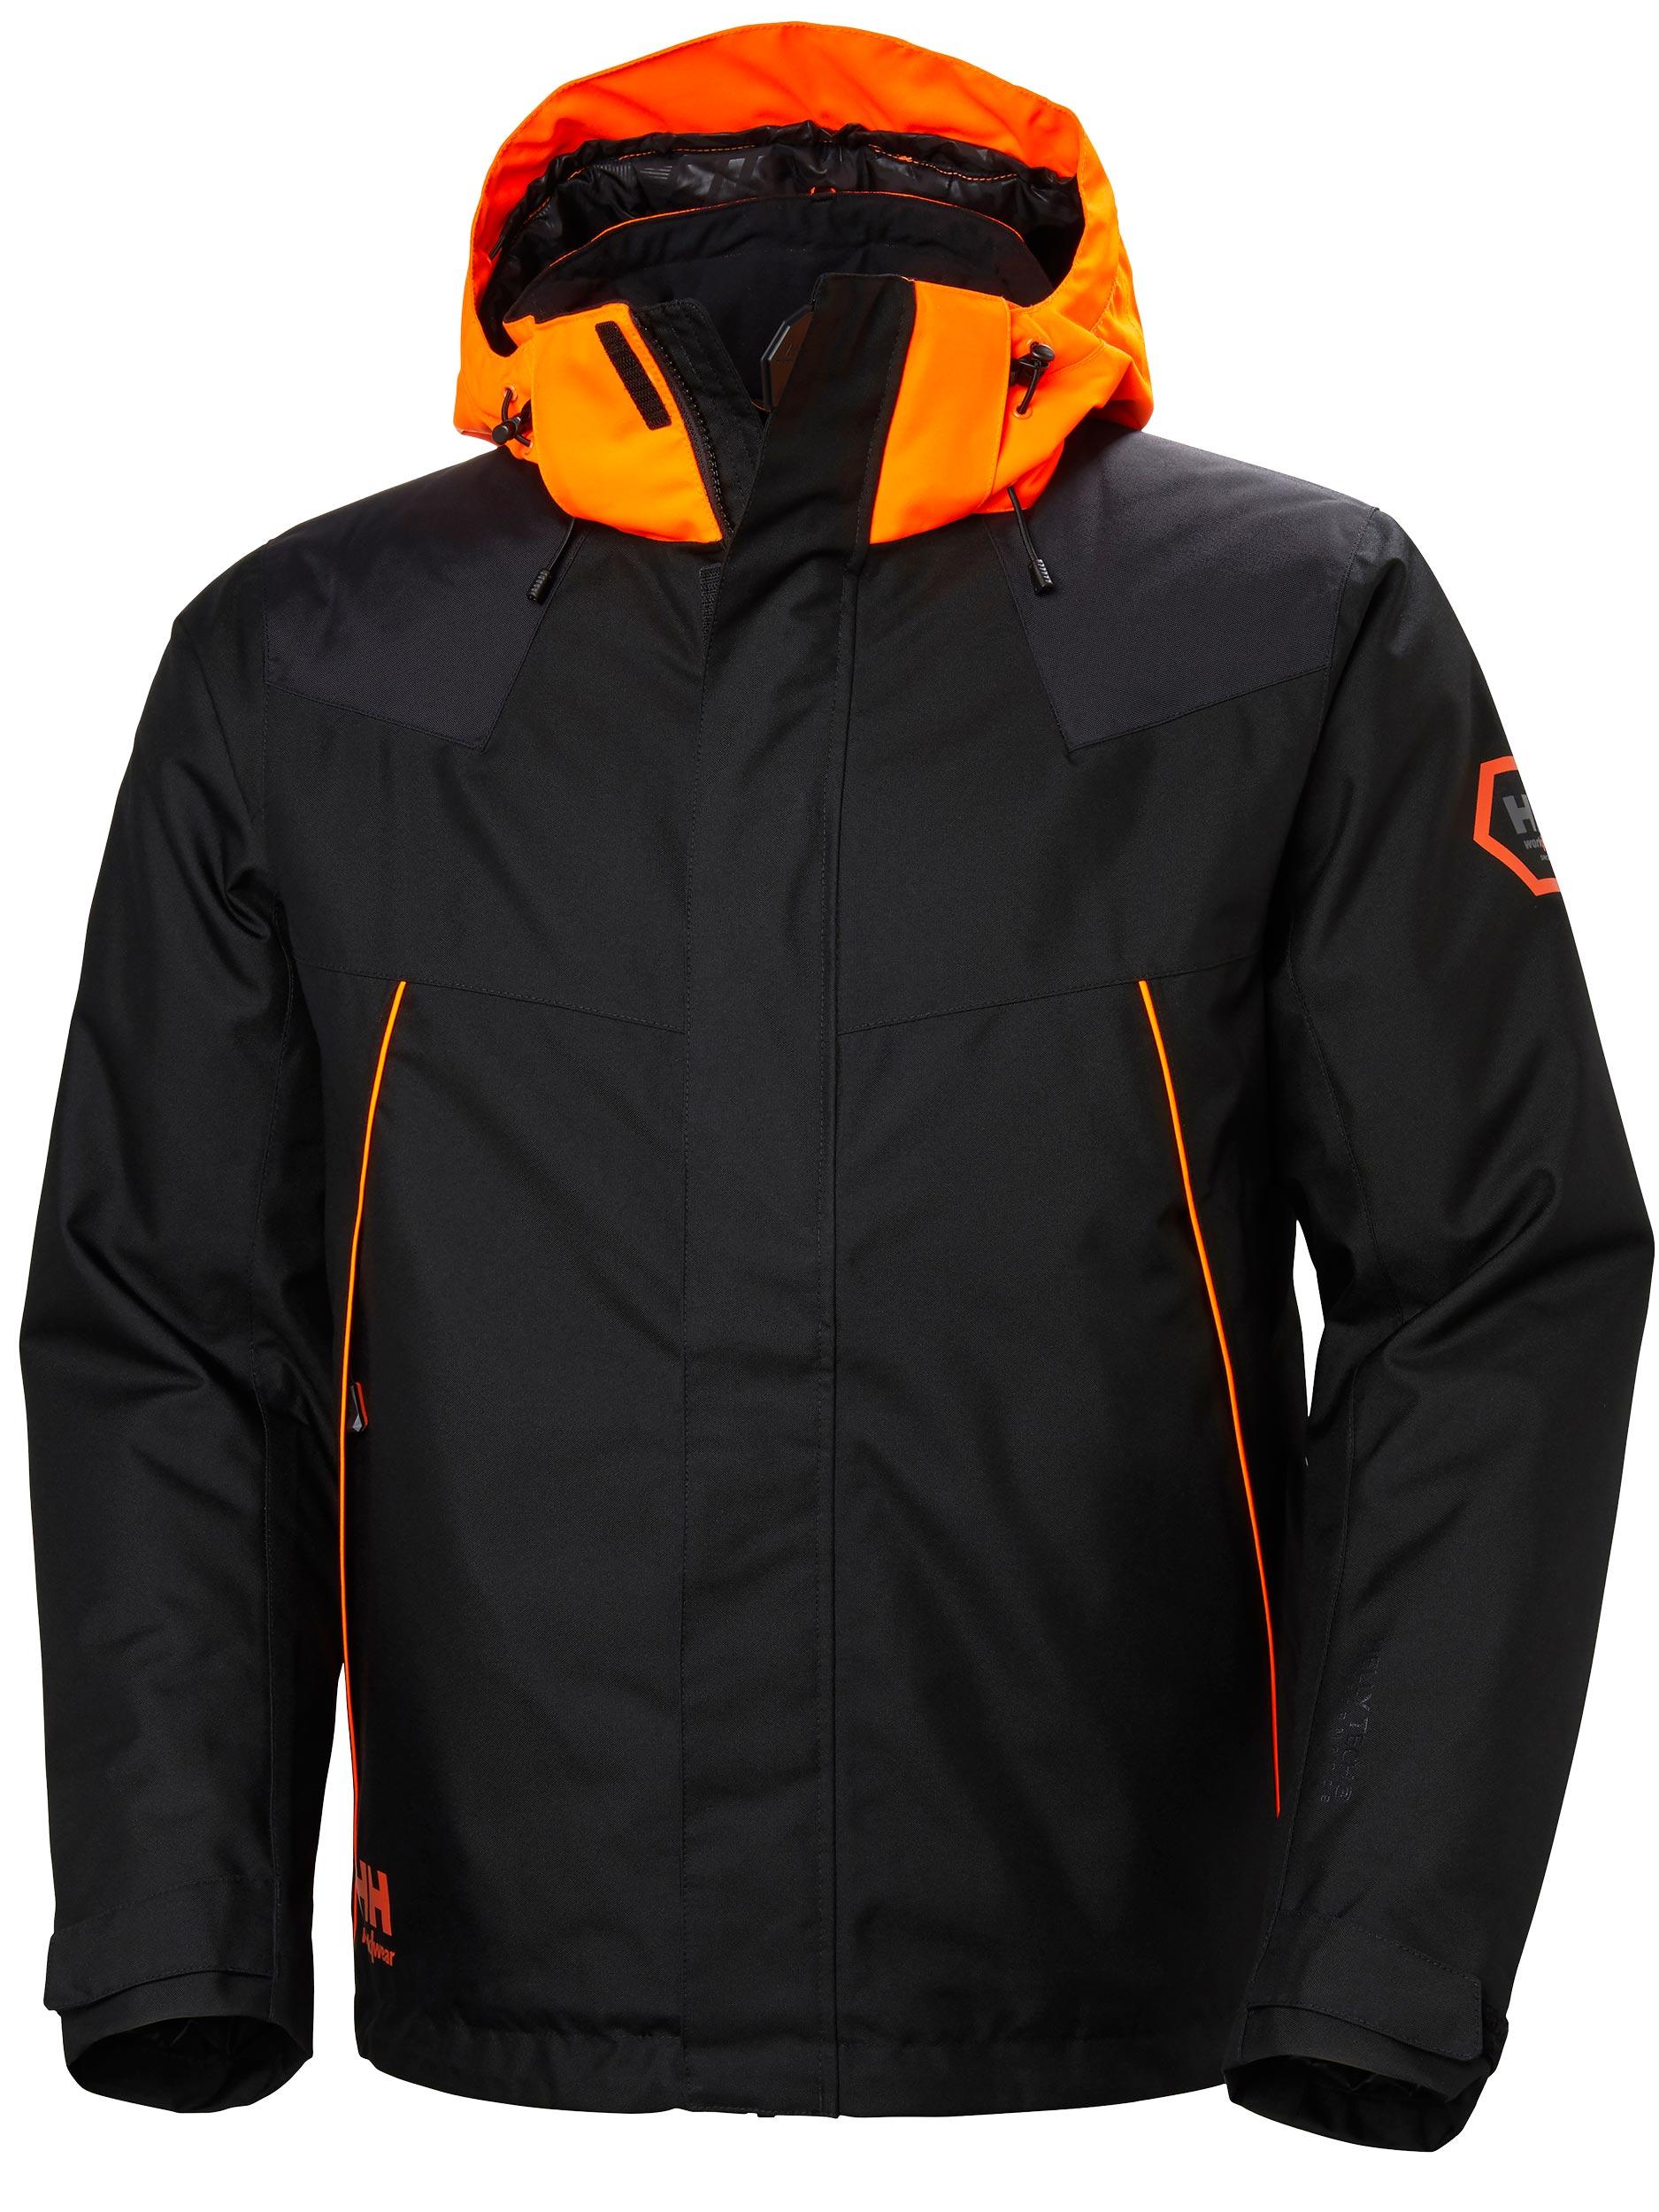 8cd7a245 Helly Hansen Chelsea Evolution Winter Jacket - 71340